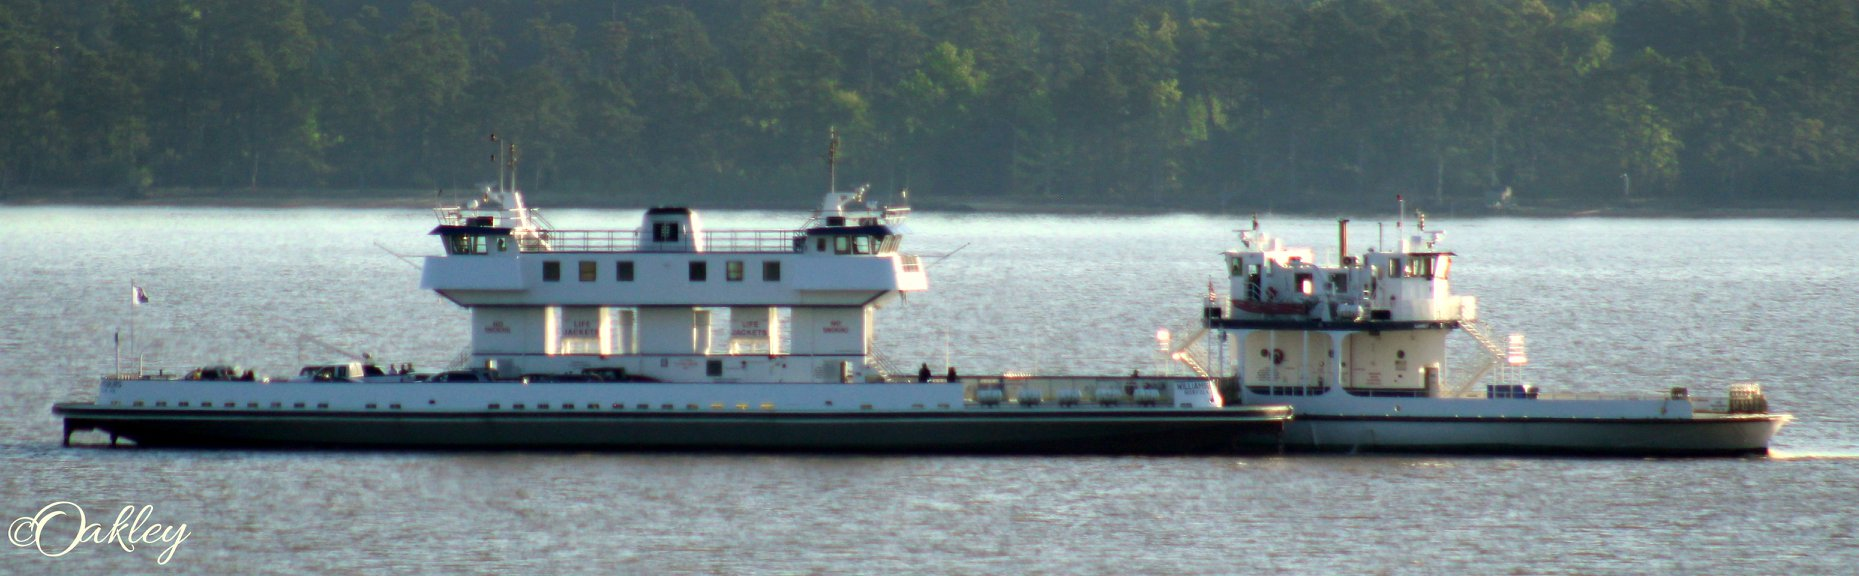 Williamsburg Ferry Issue